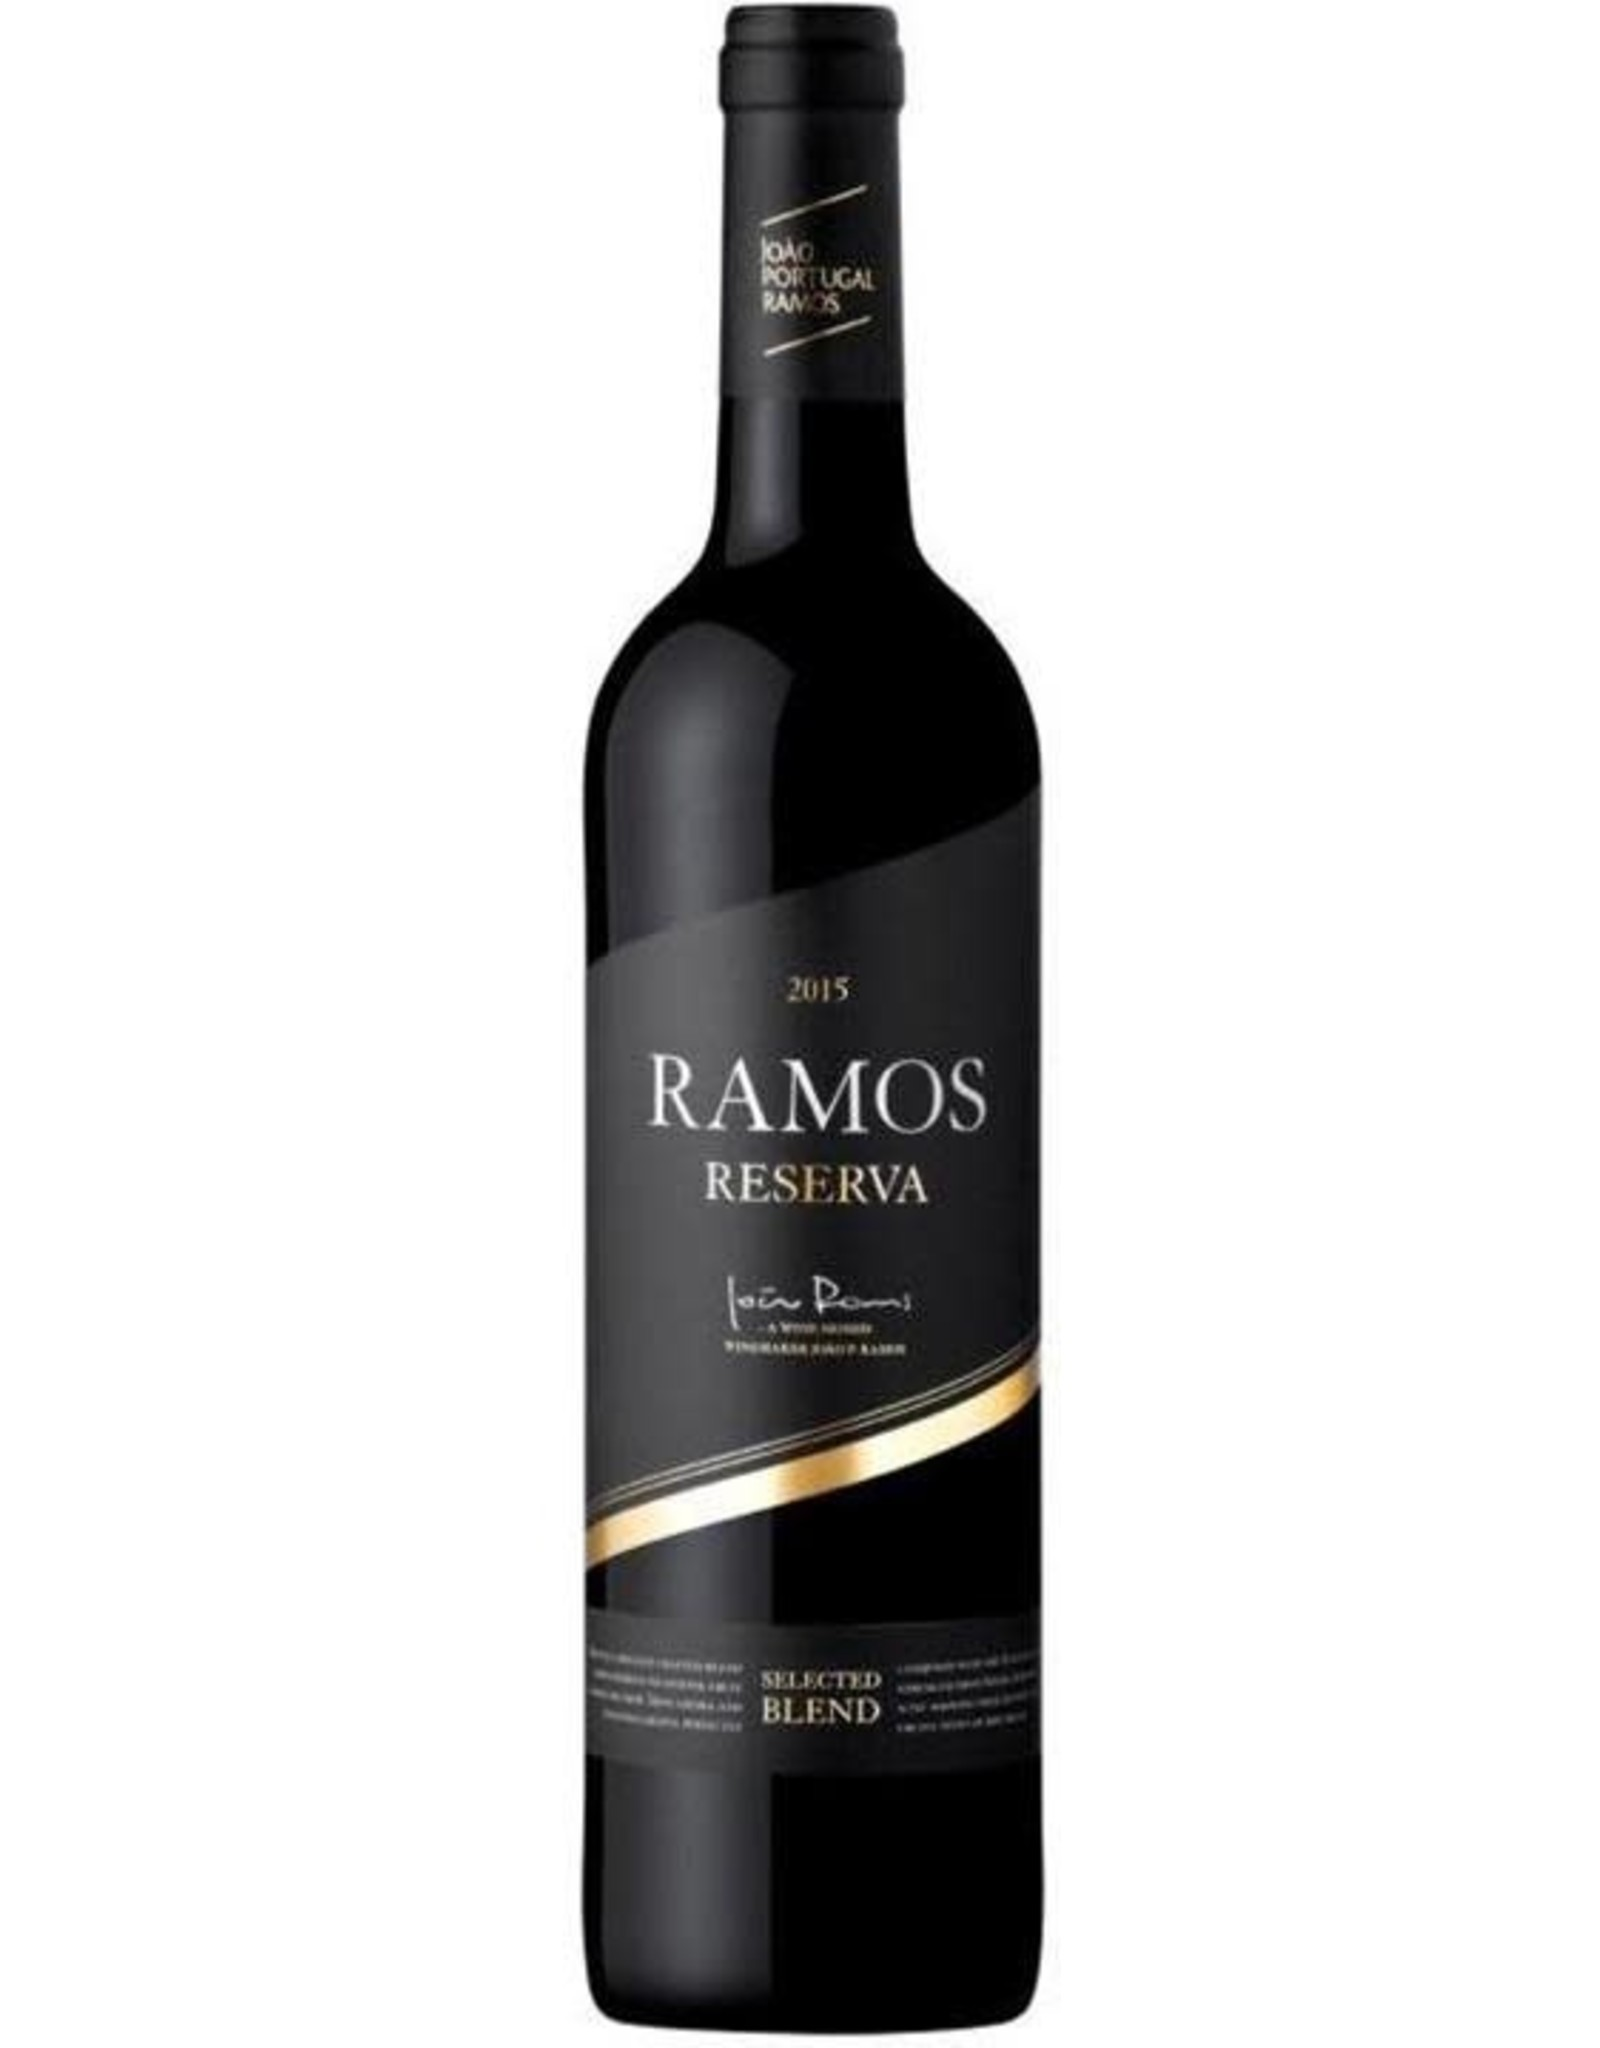 Ramos Ramos Vinho Tinto Reserva, Alentejano 2018